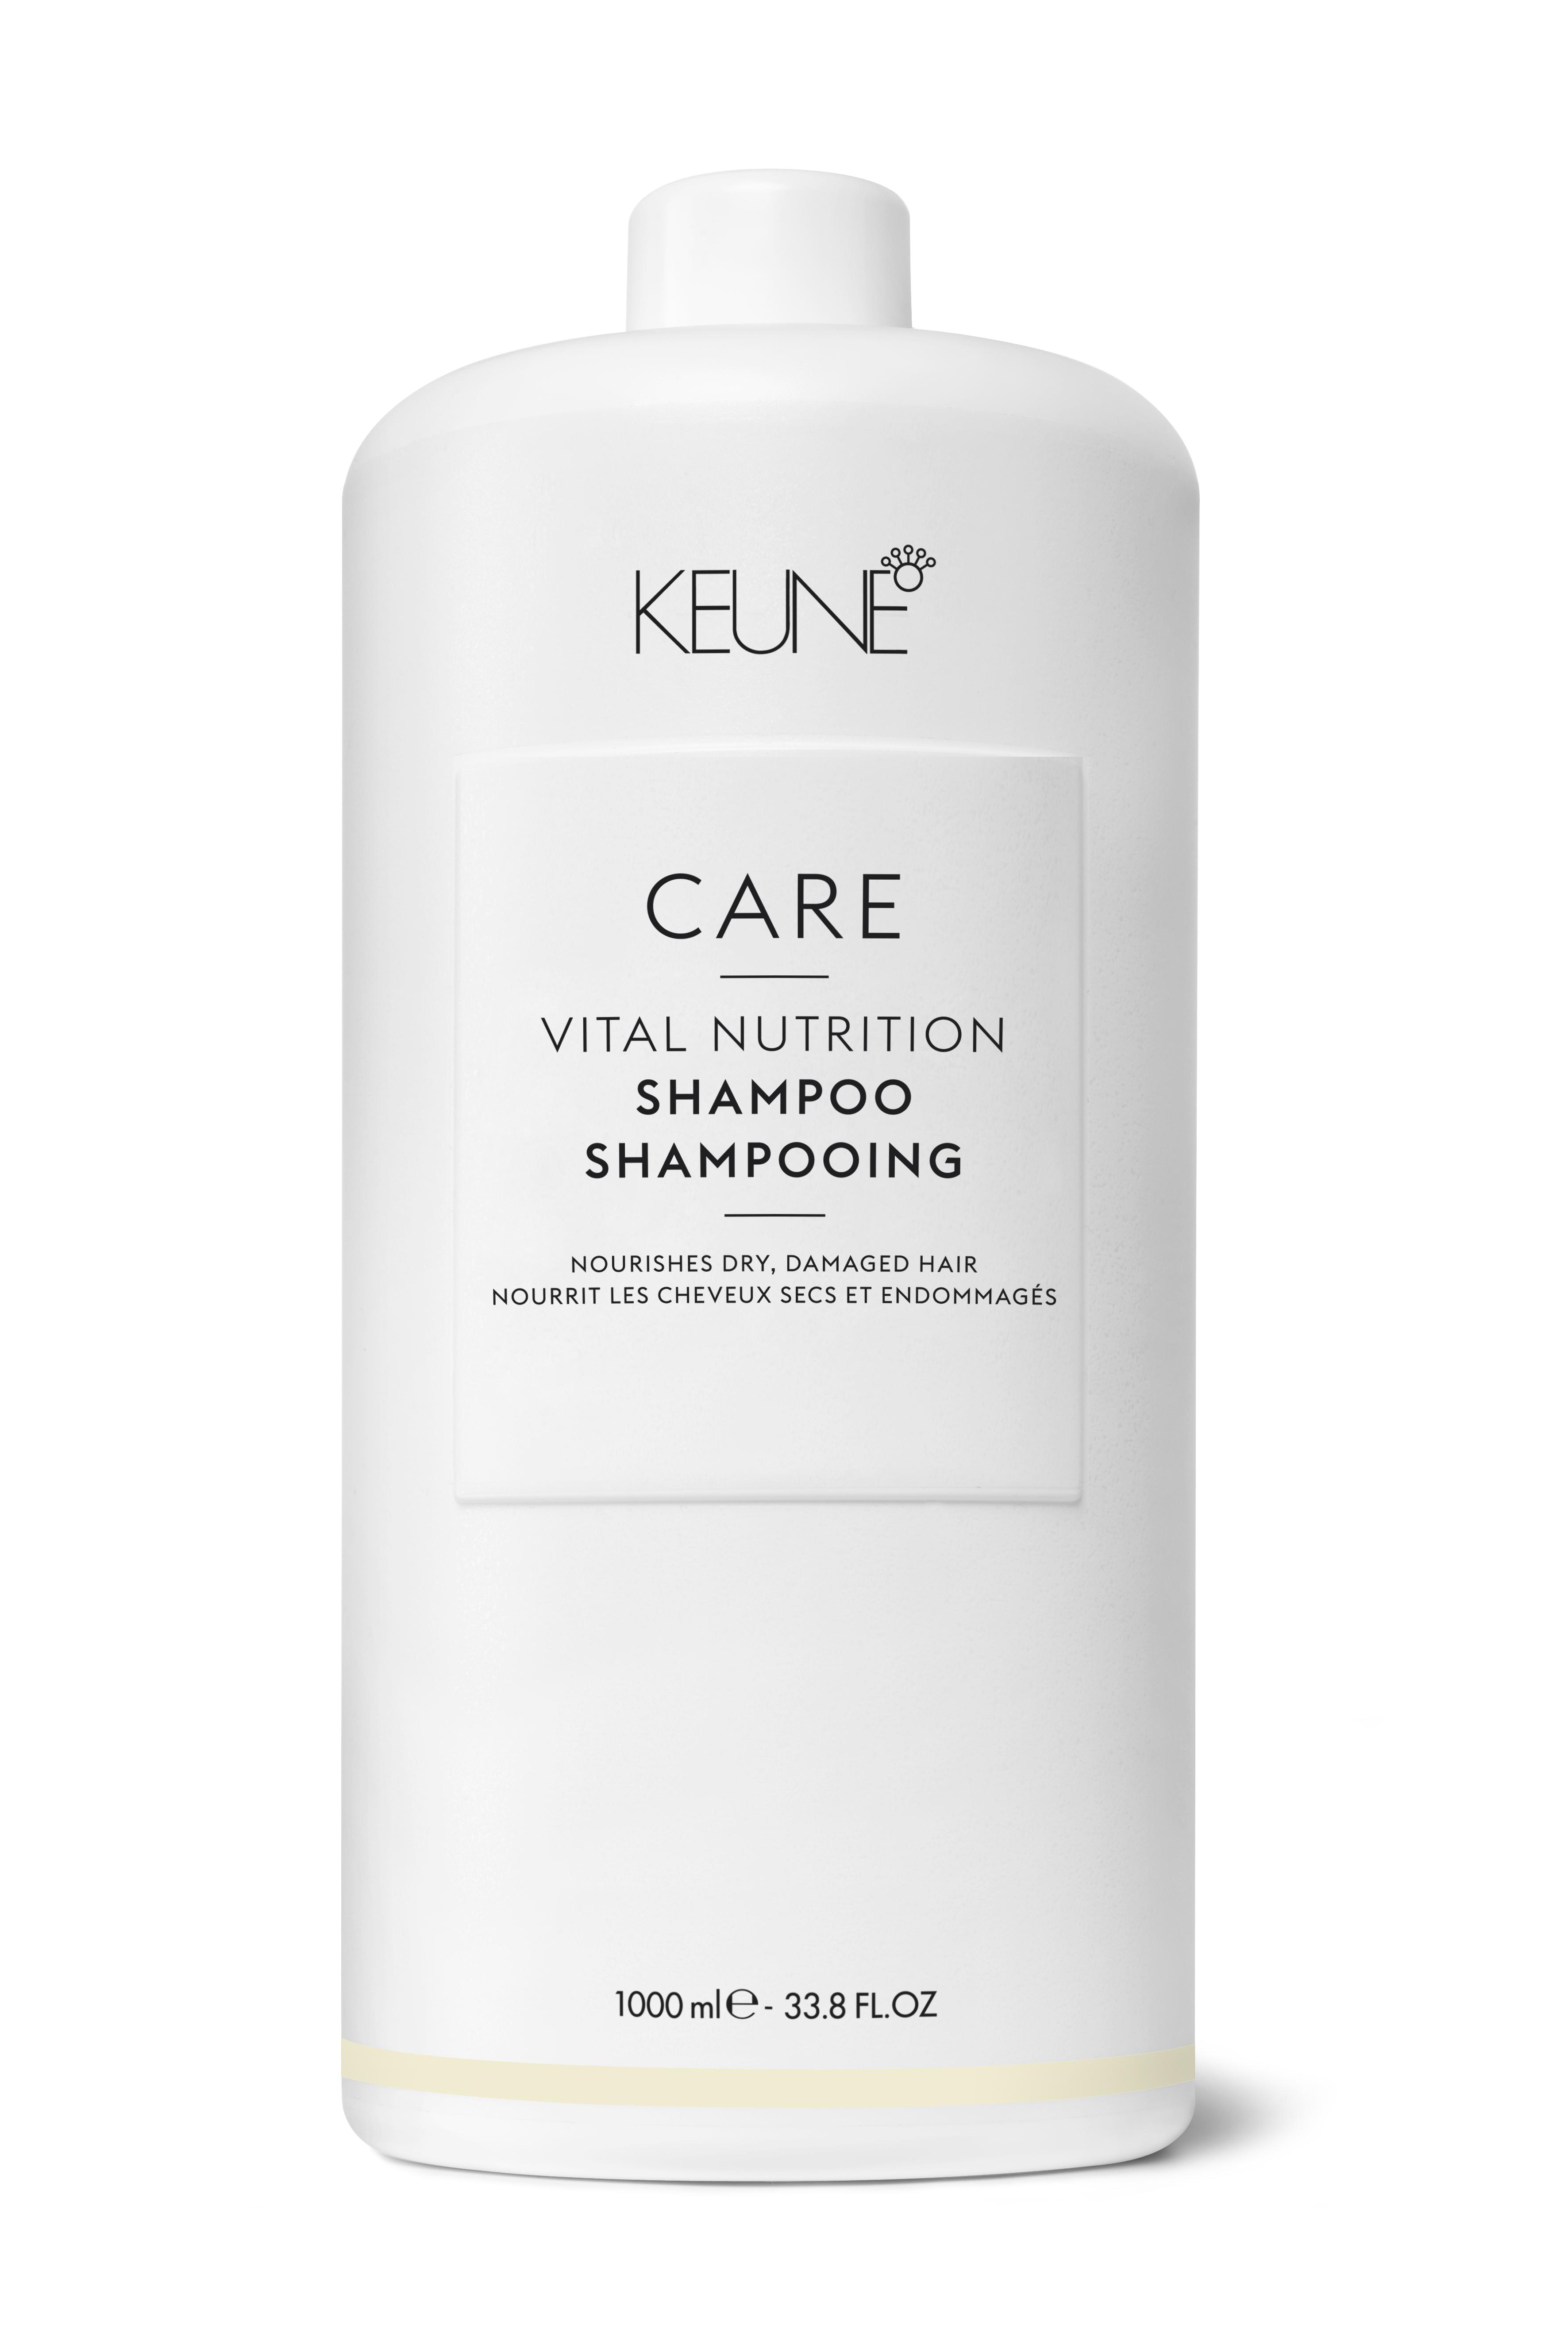 KEUNE Шампунь Основное питание / CARE Vital Nutrition Shampoo 1000мл